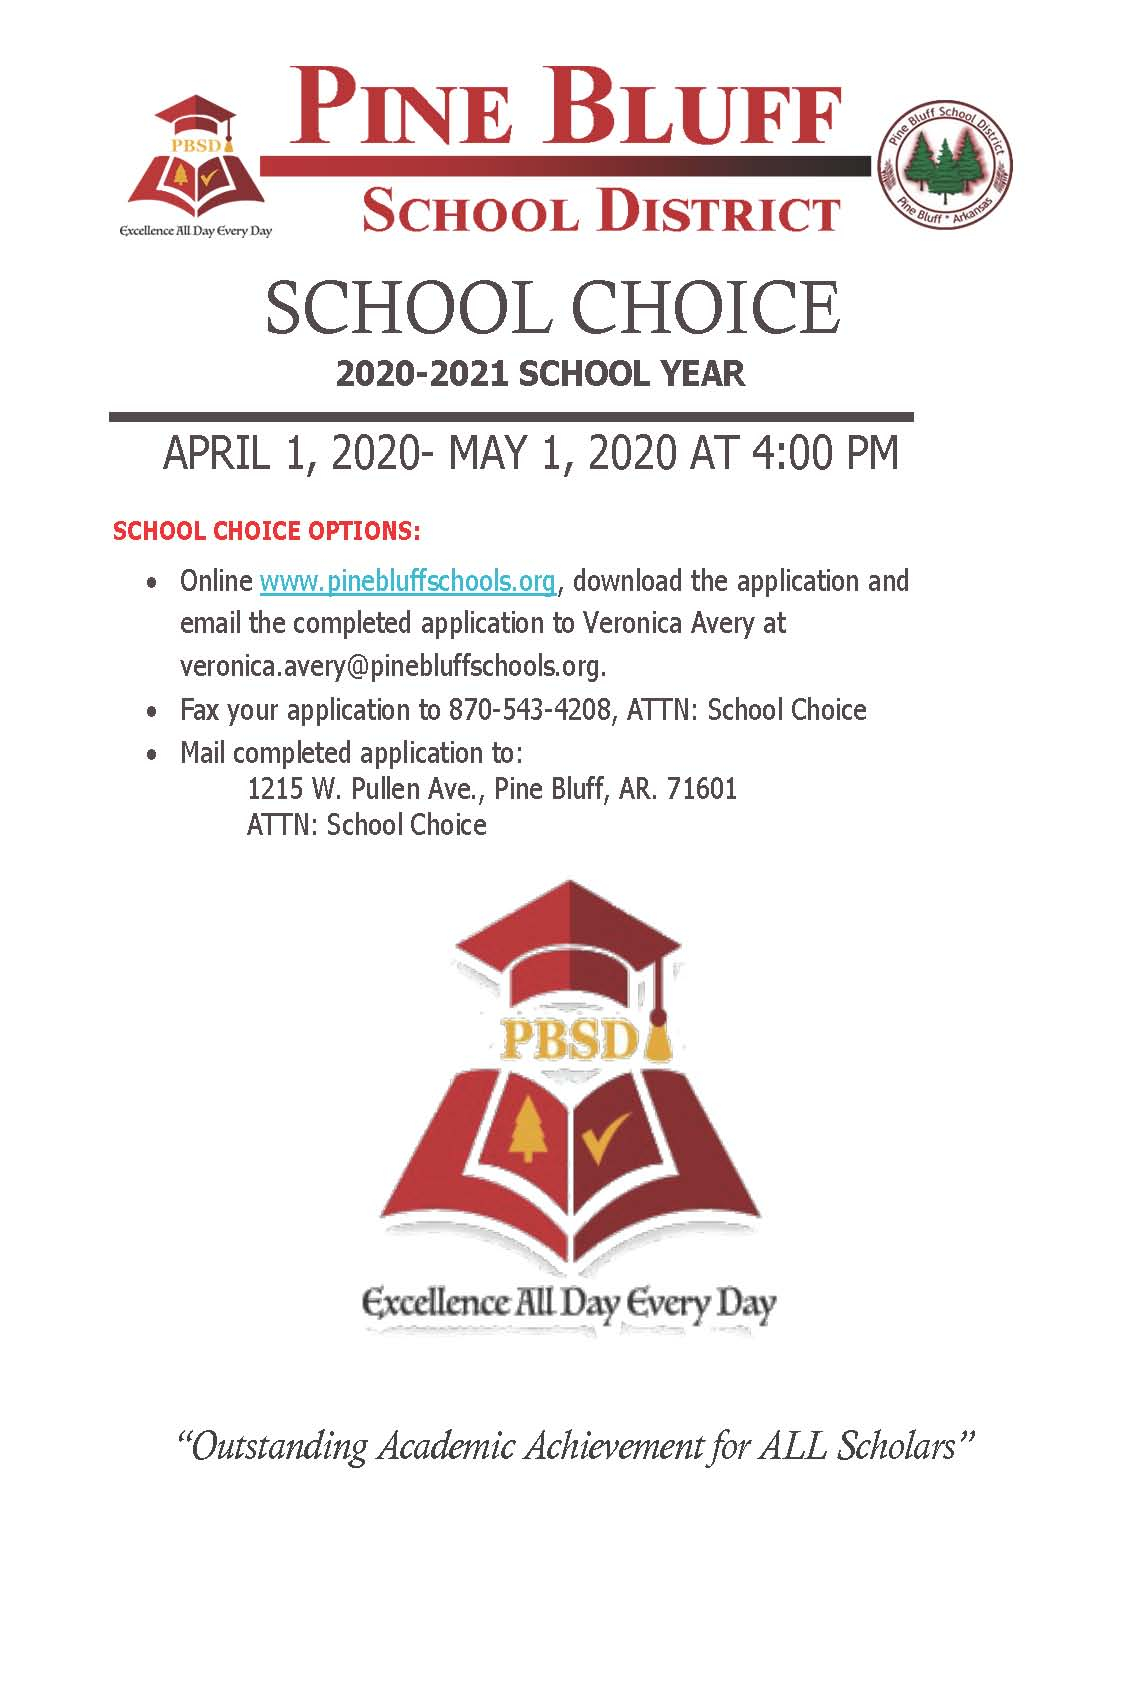 School Choice - Pine Bluff School District In Pine Bluff School District Calendar 2021